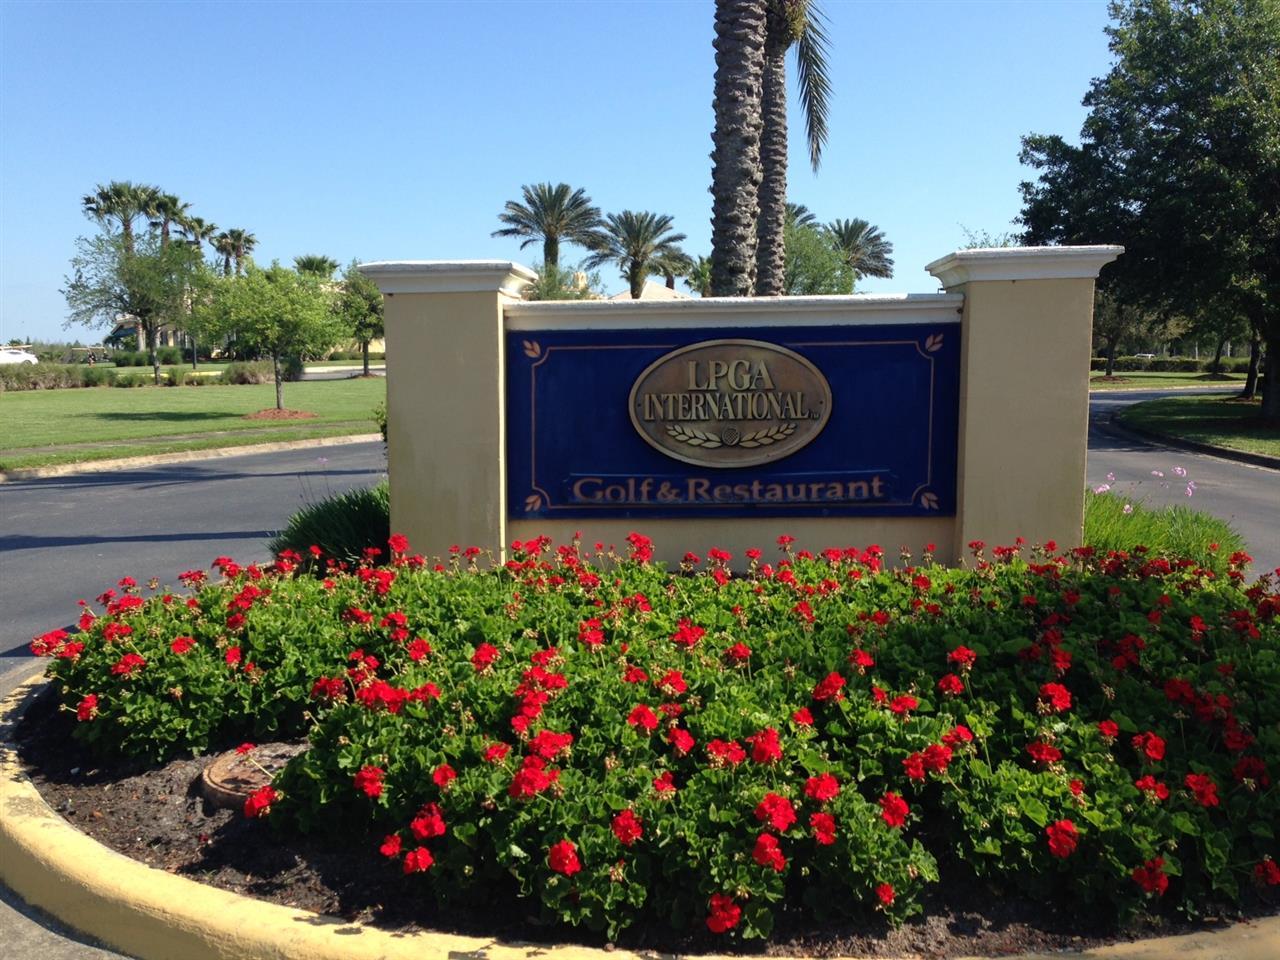 LPGA International Golf Course and Restaurant - Daytona Beach, Florida